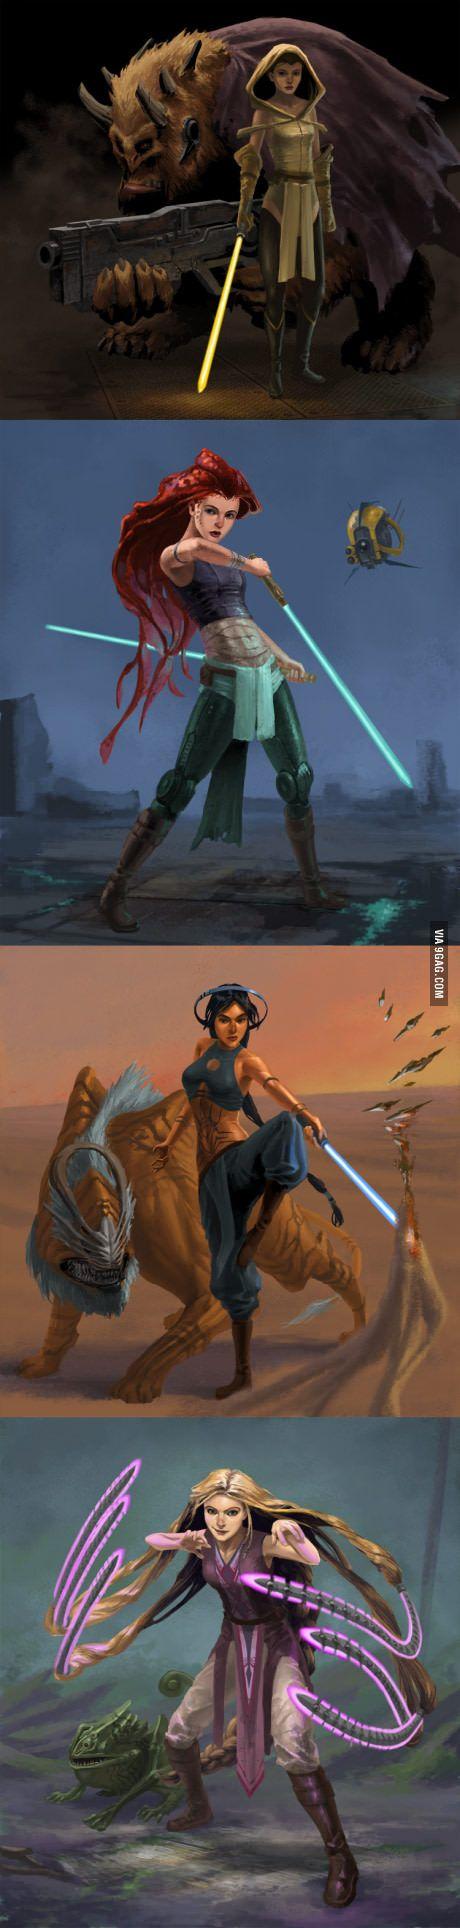 4 Disney Princess Jedi by Phill Berry